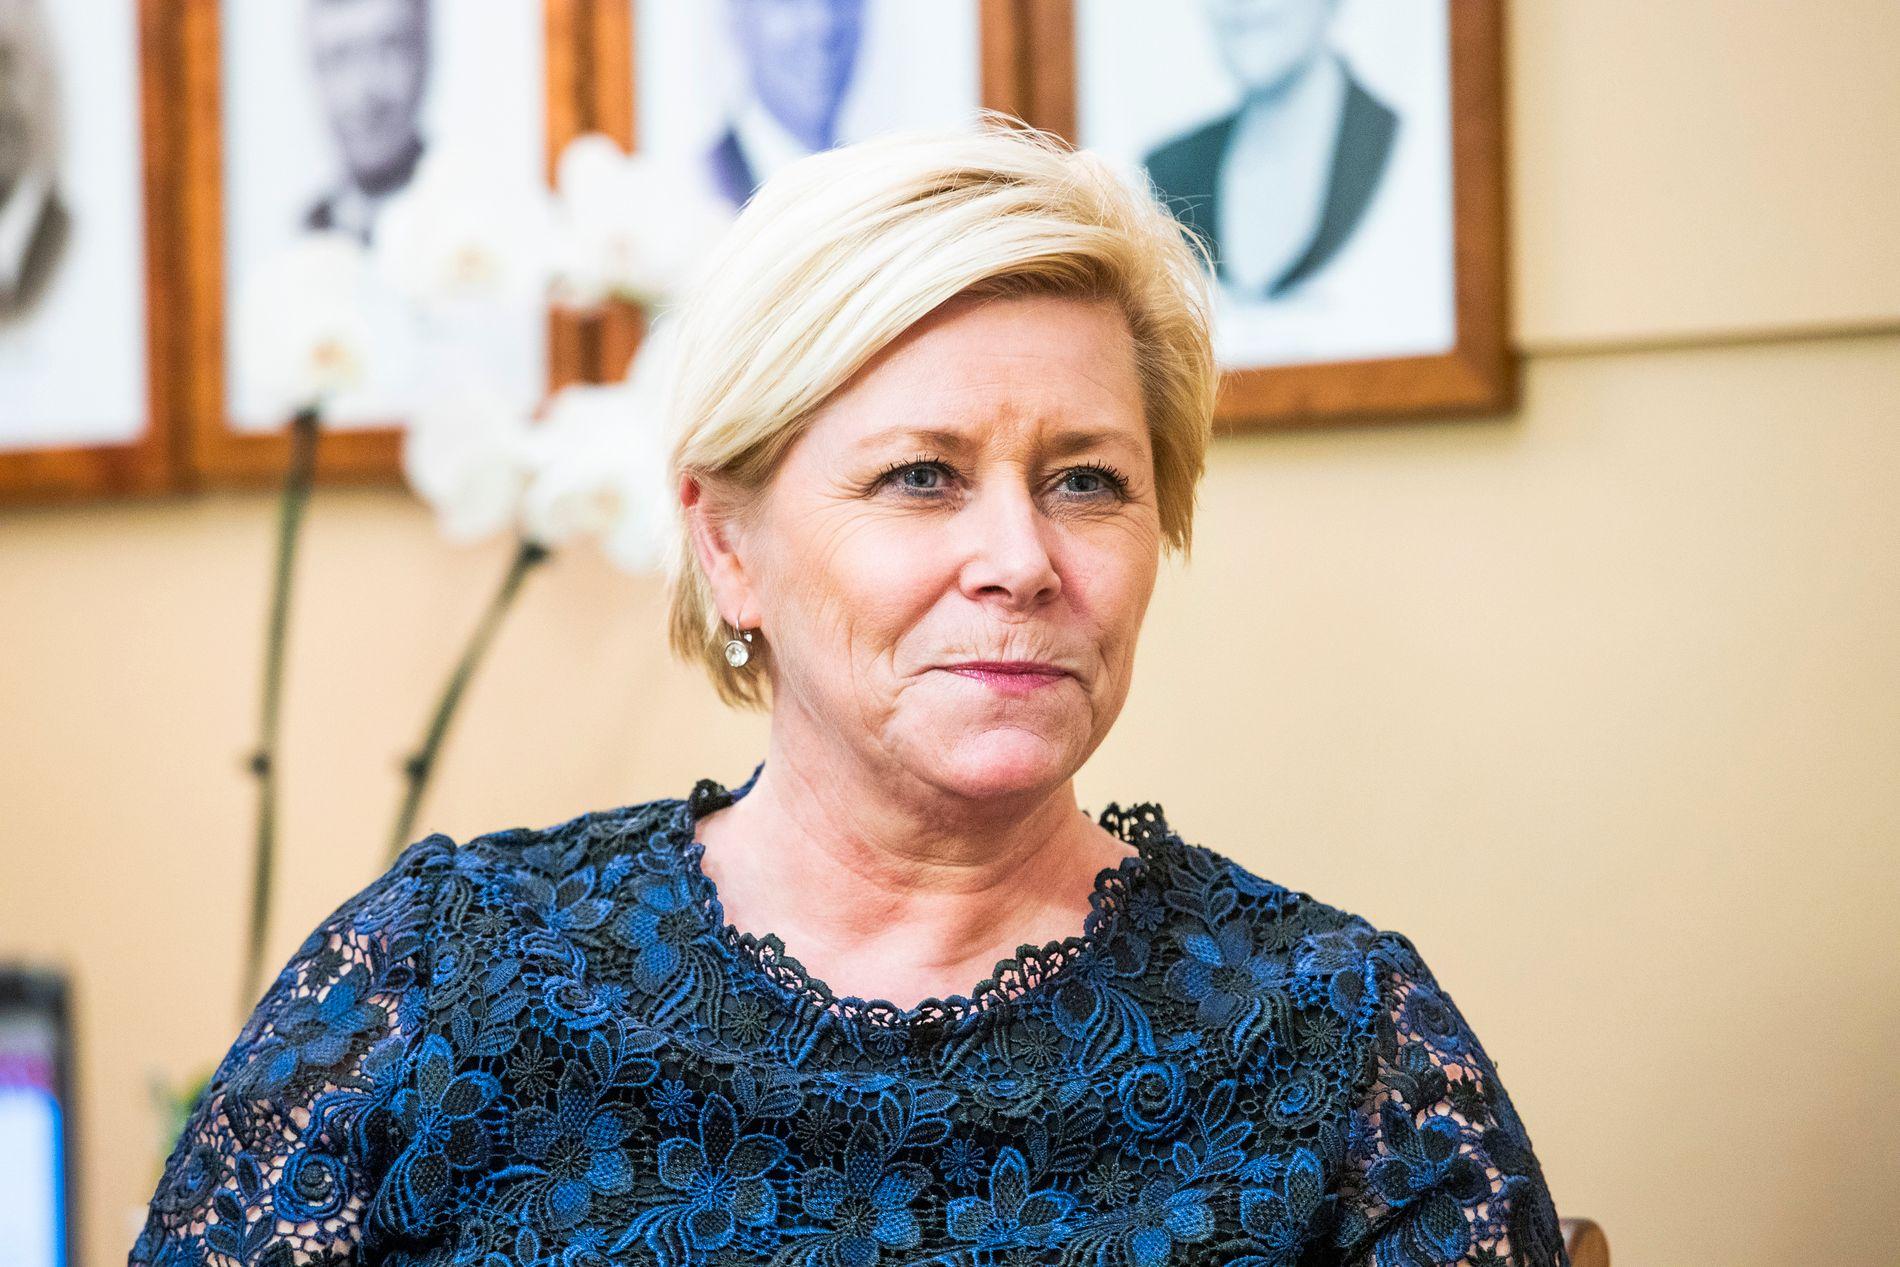 HOLDER FAST: Frp-leder Siv Jensen beholder tyngden med syv statsråder i regjering. KrF og Venstre får tre hver.